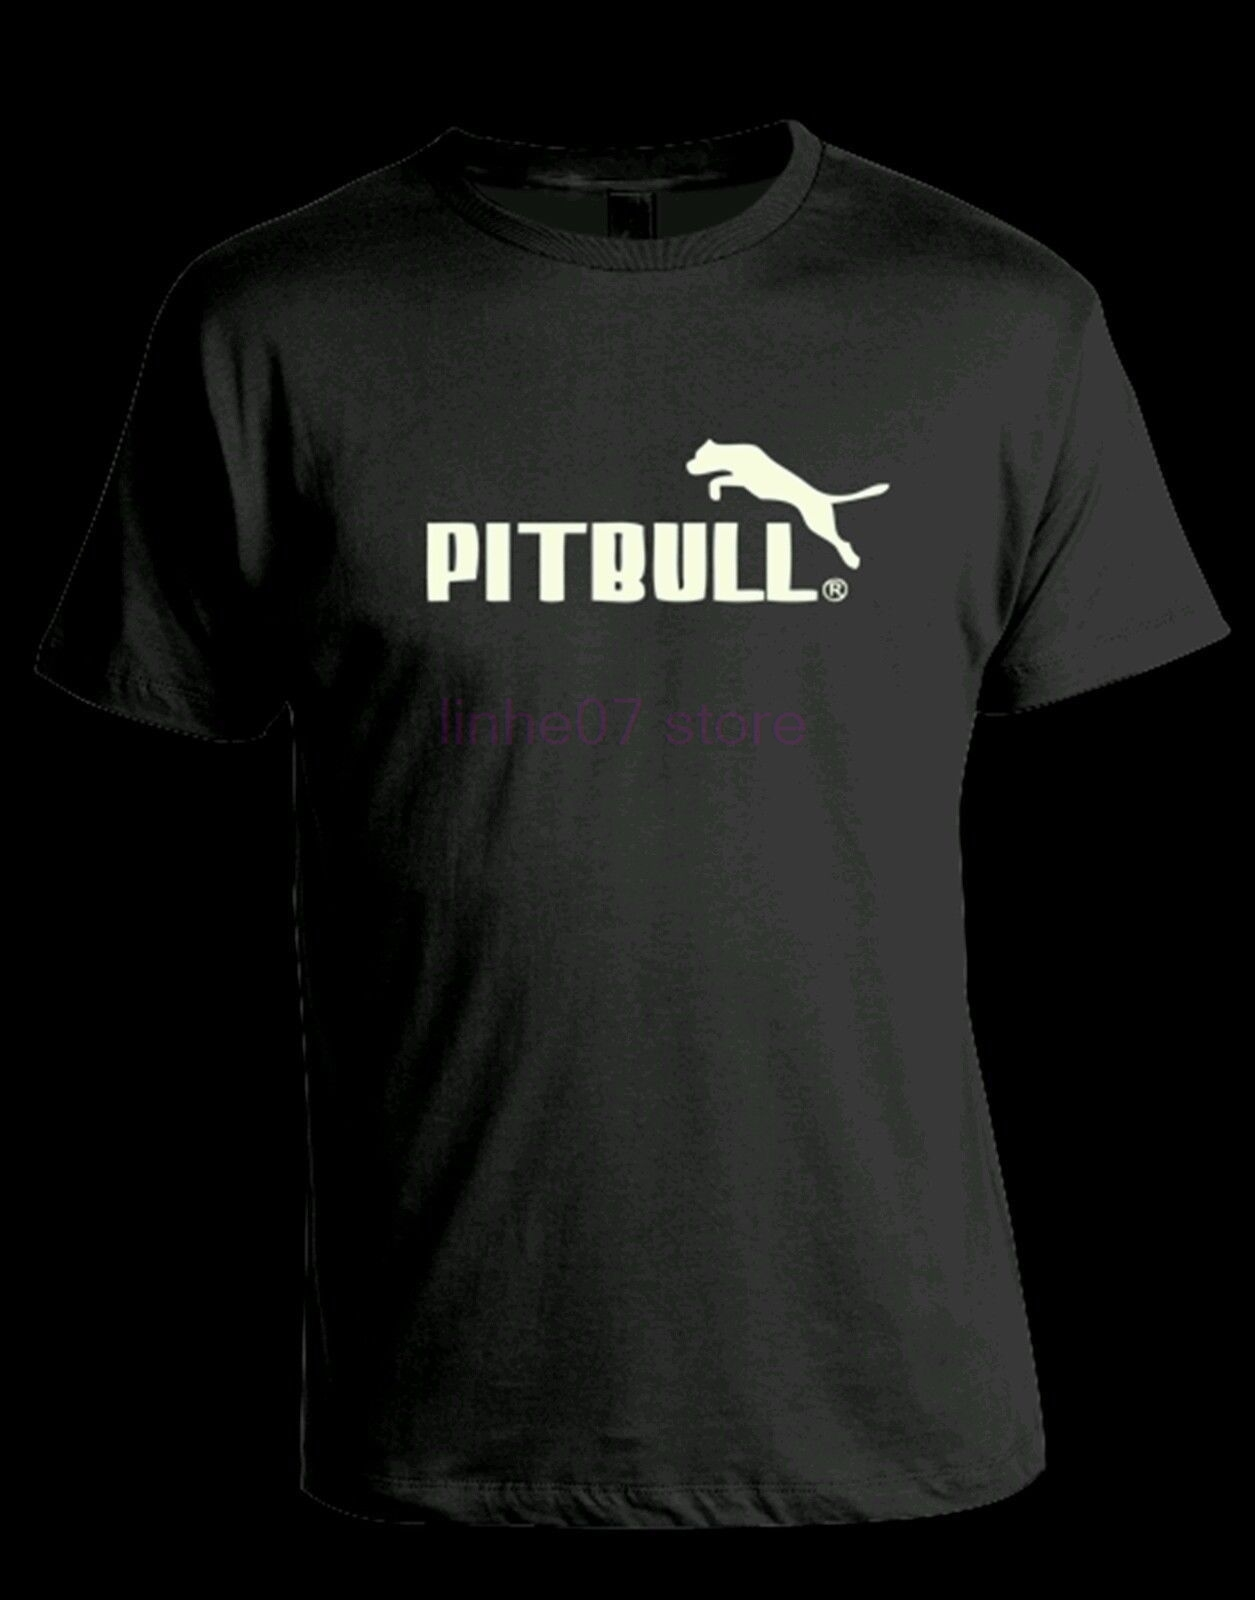 Gildan T-Shirt Pitbull Hund Hund Pit staff Bull s, um die XXL